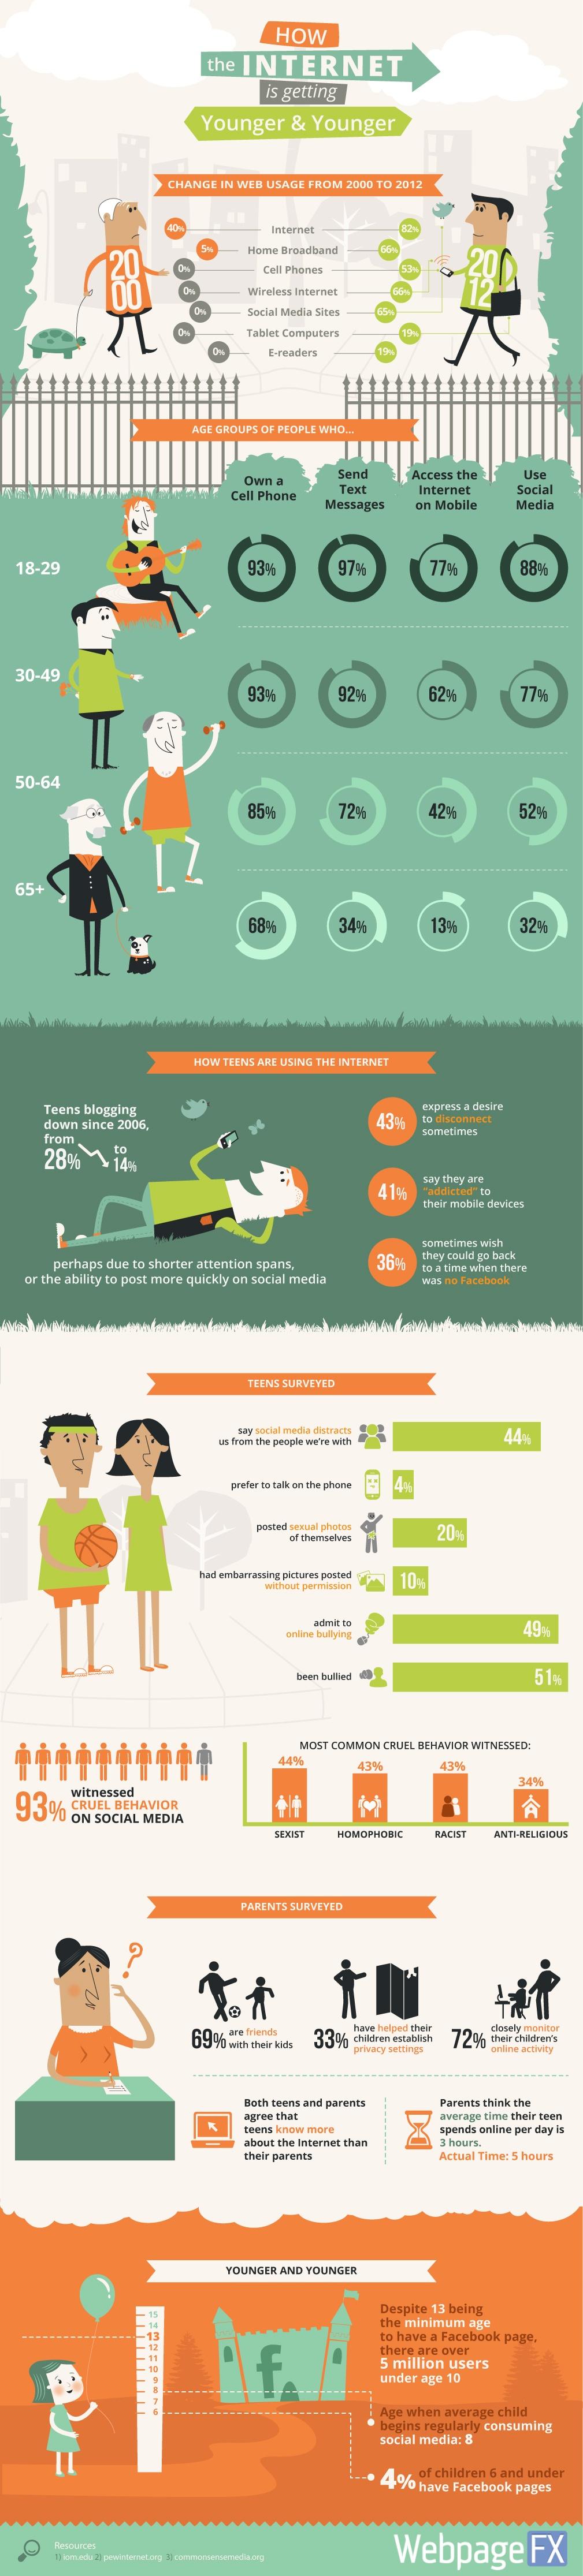 Teenage Internet Usage Infographic